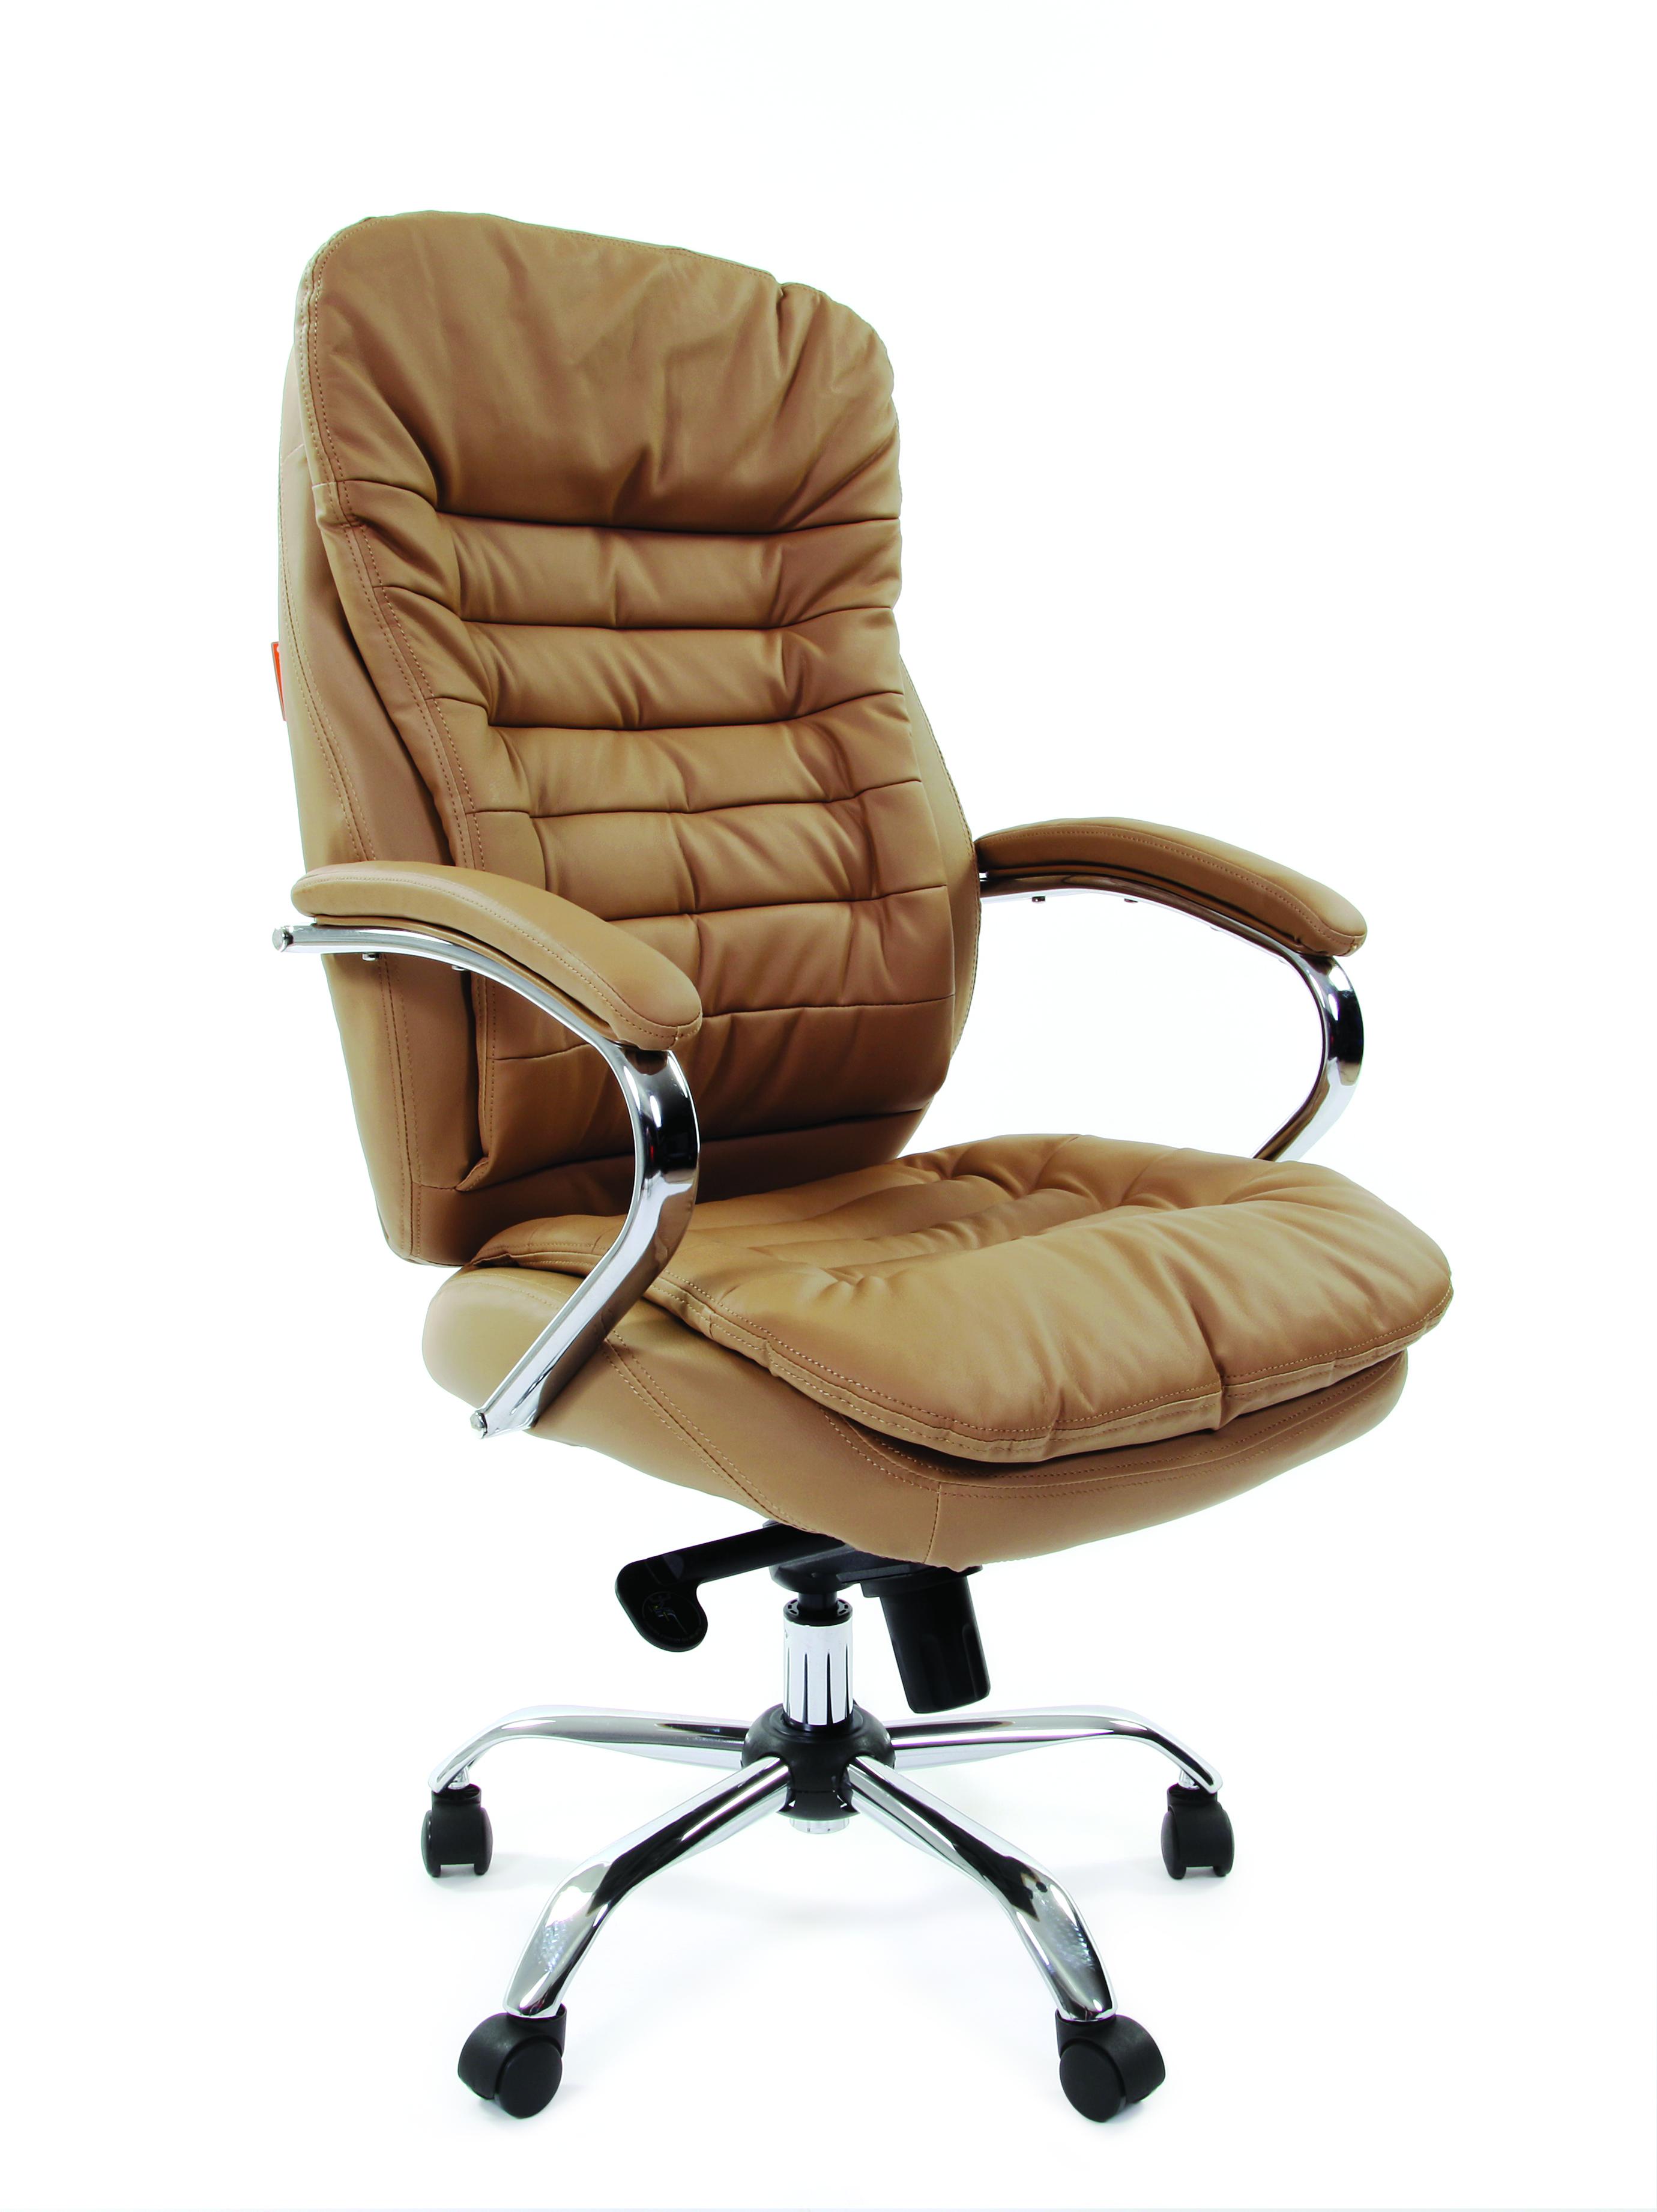 Кресло для руководителя CHAIRMAN 795 эко